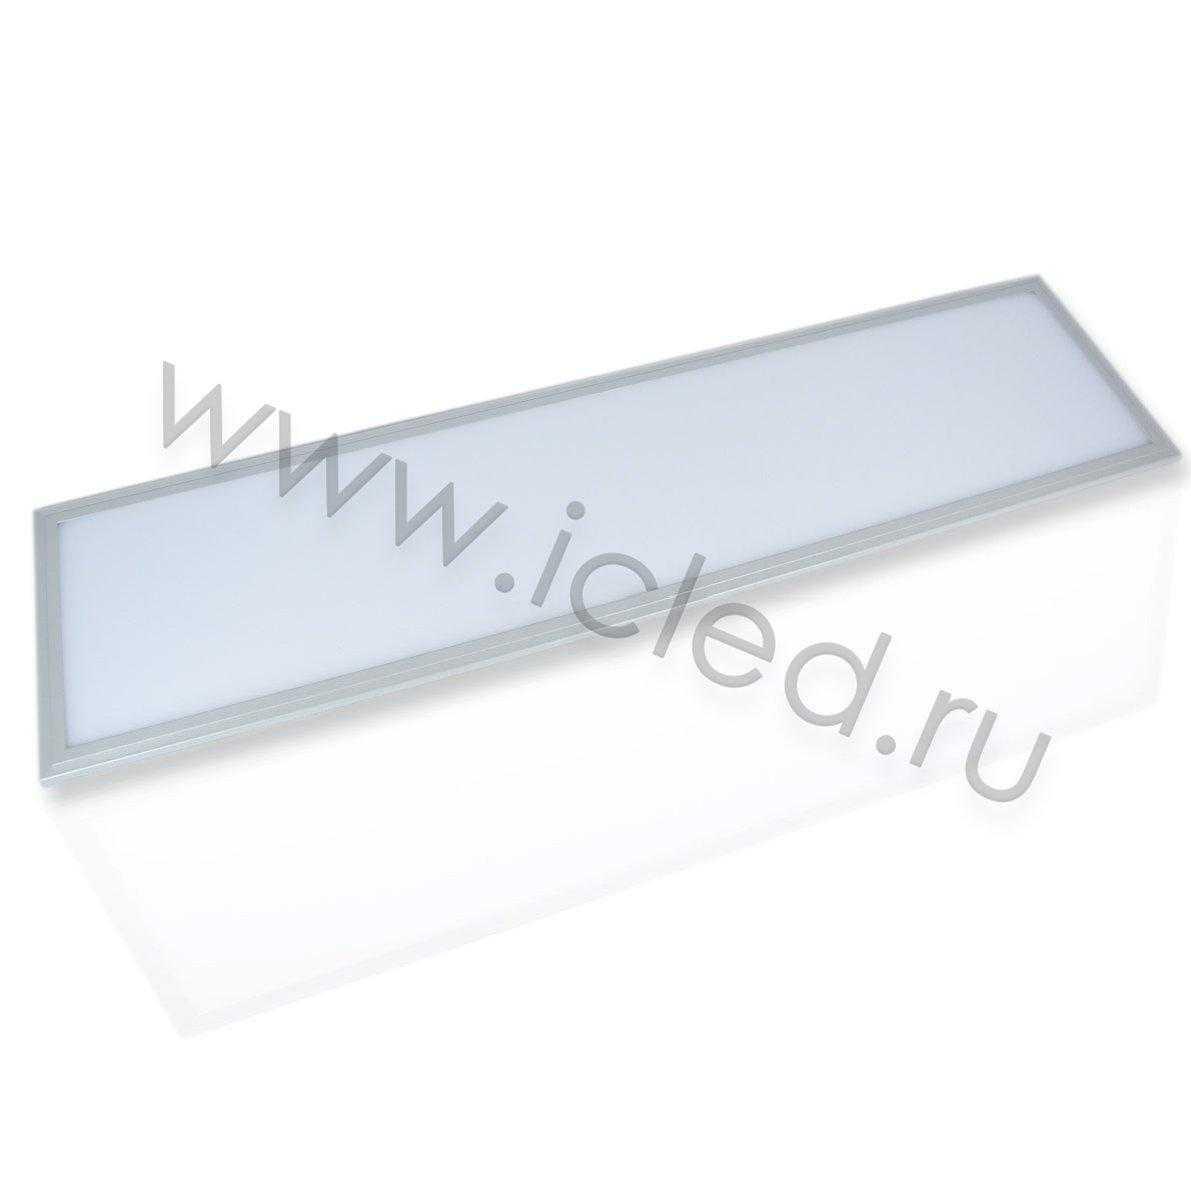 Светодиодная панель 300x1200 (45W, 220V, Warm White)